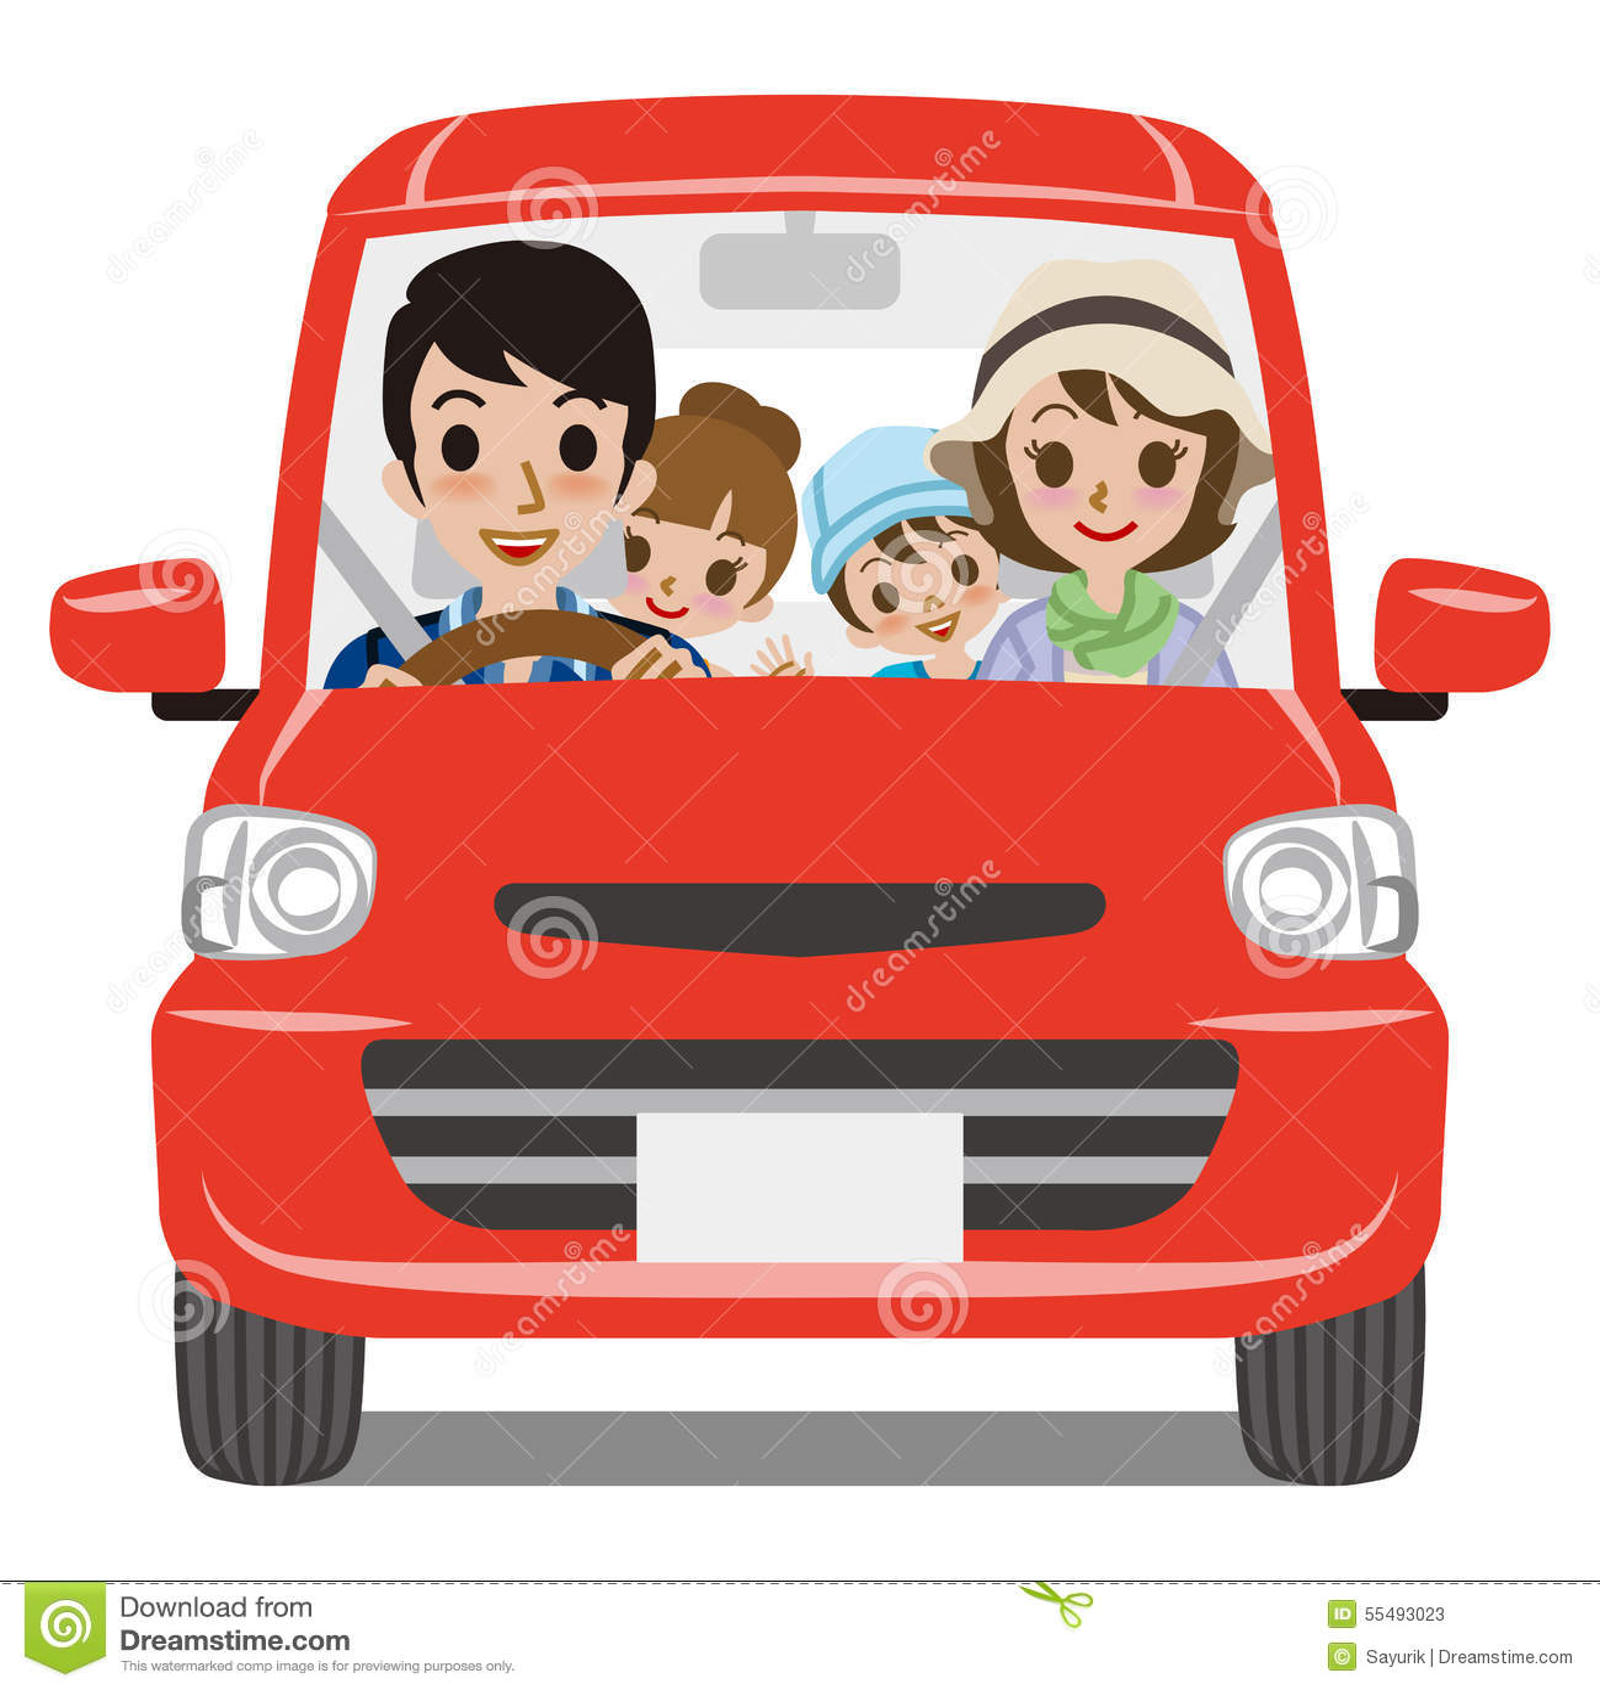 Free Cliparts Car Drive